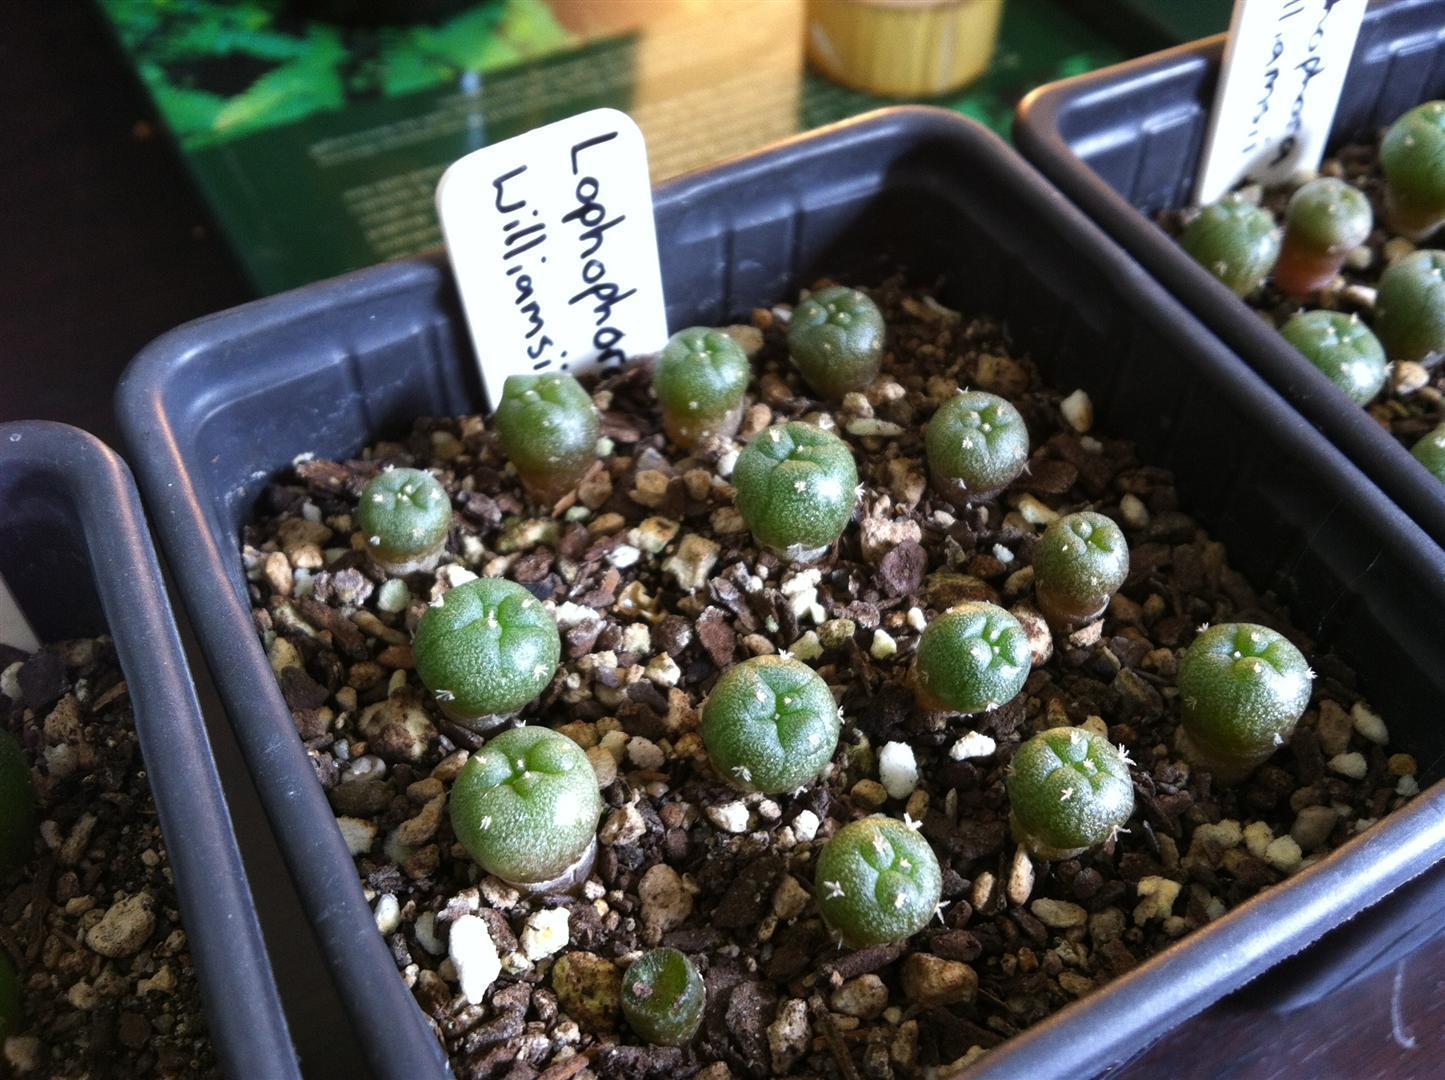 Lophophora Growers Unite! - The Ethnobotanical Garden